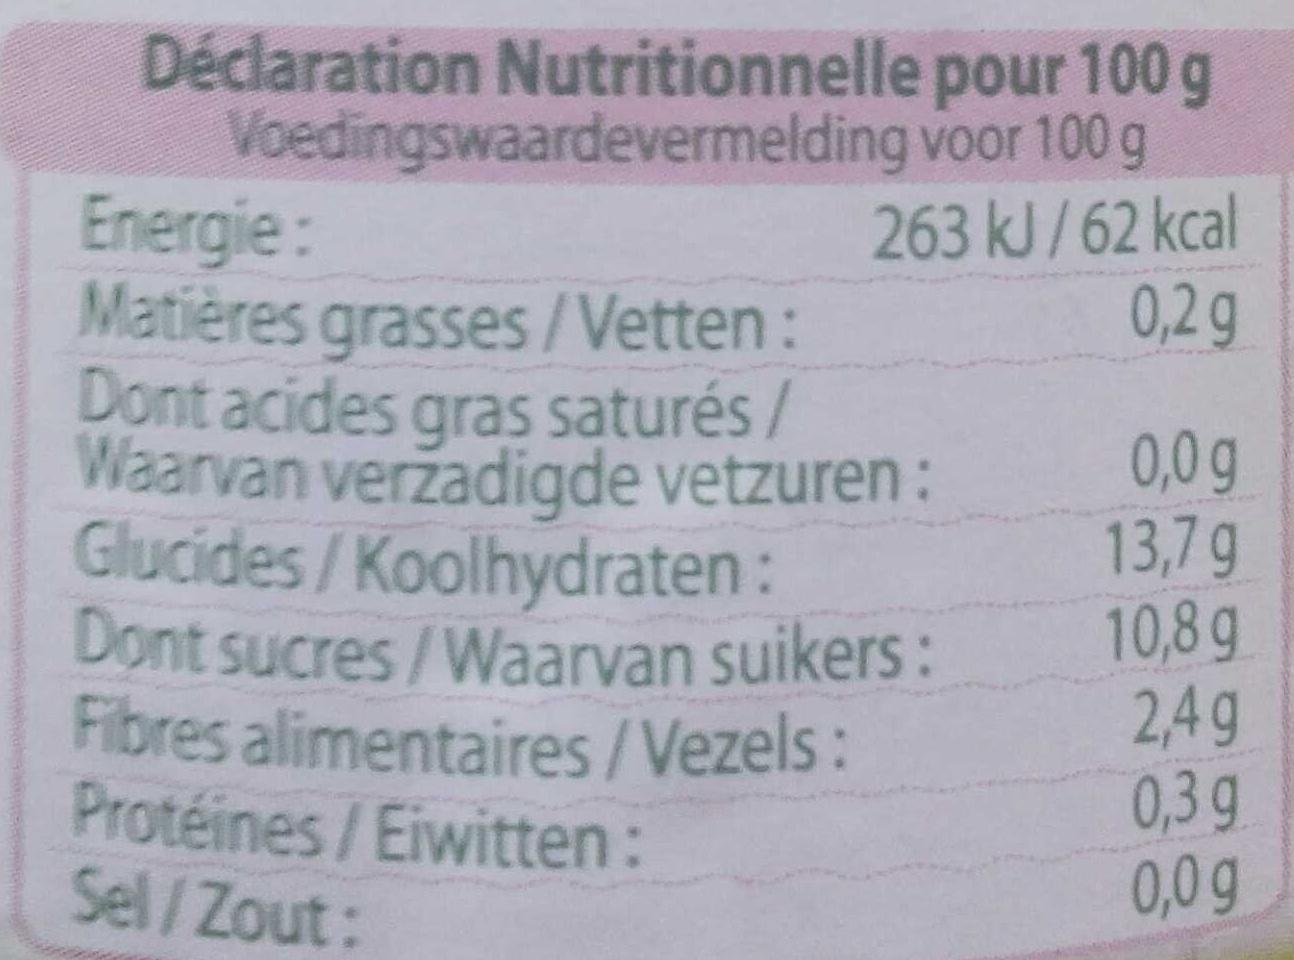 Le grand Dani'Pom pomme - poire - Voedingswaarden - fr